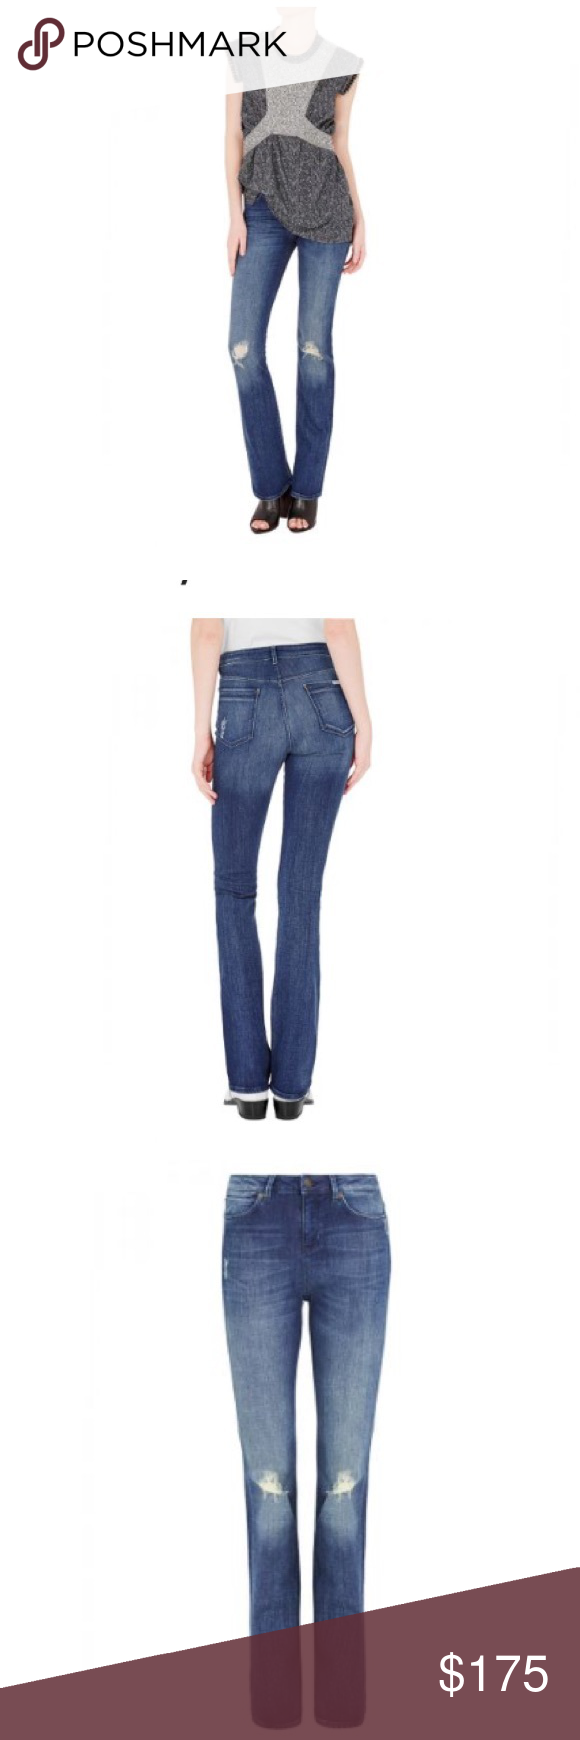 Sass And Bide Hi Rise Flare Denim Nwt Sass And Bide Hi Rise Flare Denim Nwt Sass Bide Jeans Flare Wide Leg Denim Flares Fashion Design Fashion Trends